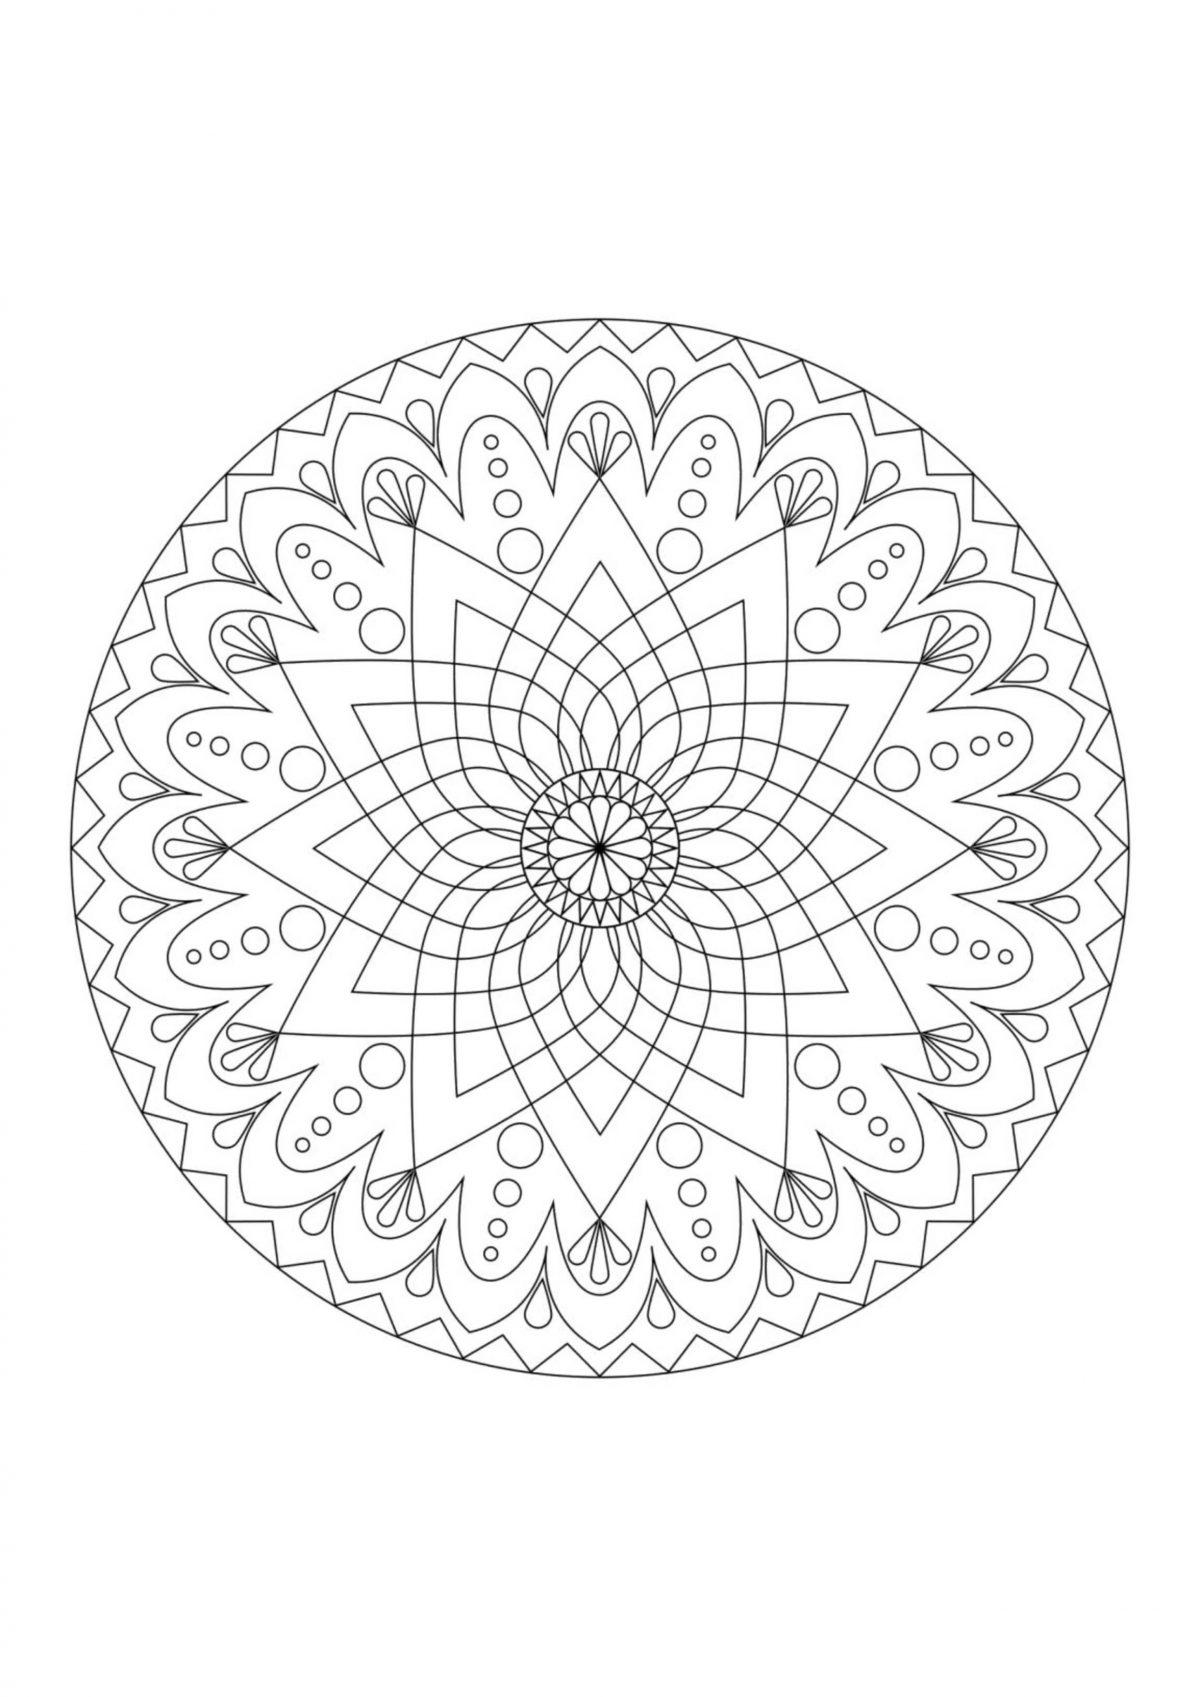 "Раскраска ""Узор в круге"" - Раскраски А4 формата для распечатки"